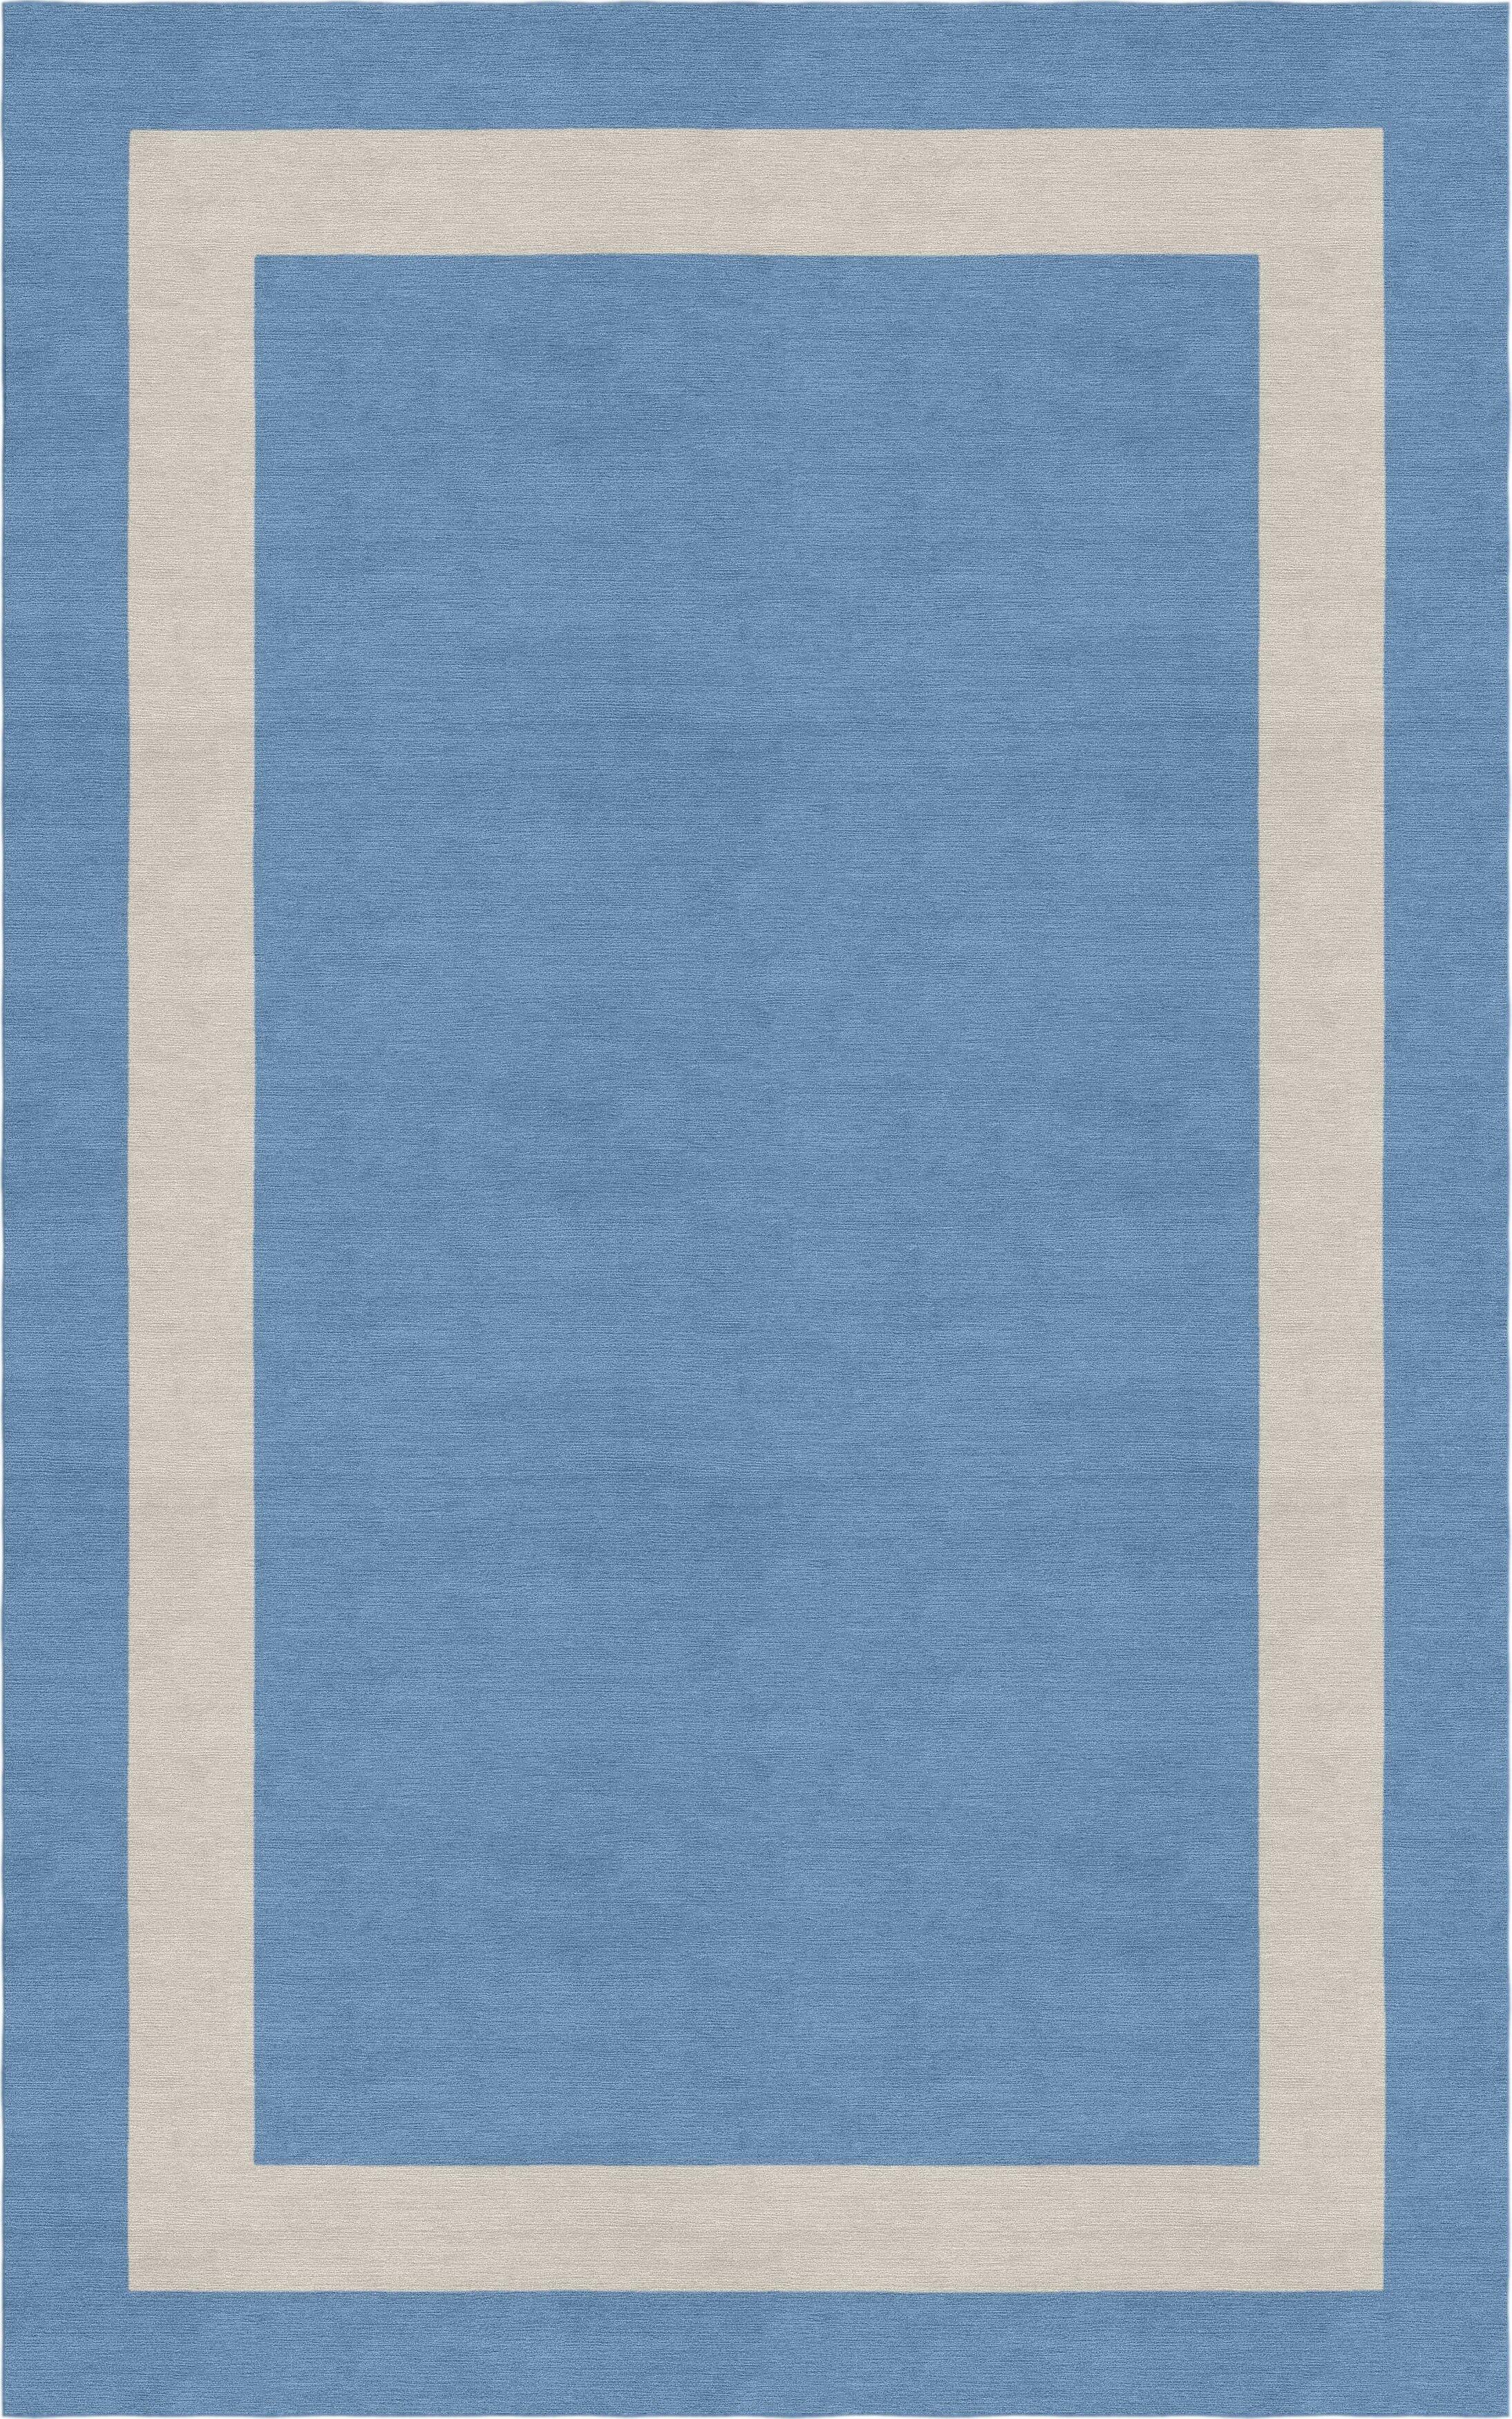 Bhamidipati Border Hand-Tufted Wool Aqua/Silver Area Rug Rug Size: Rectangle 9' x 12'